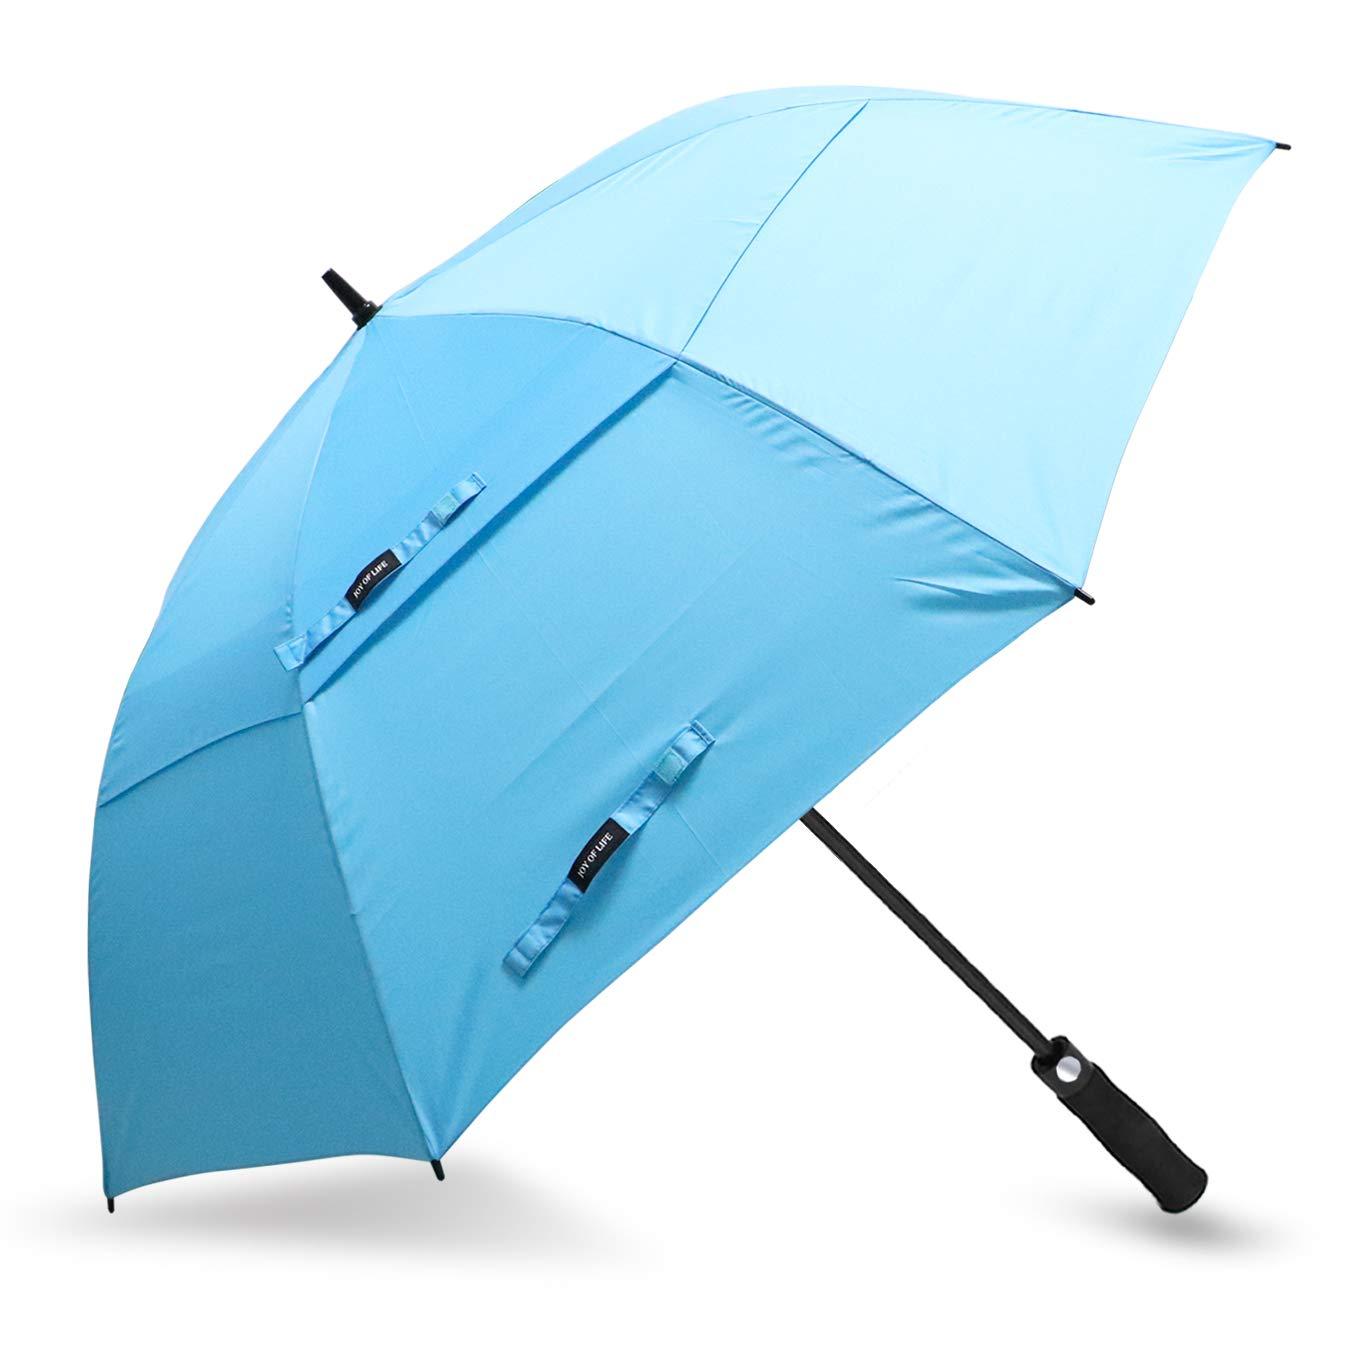 ZOMAKE Automatic Open Golf Umbrella 62/68 Inch - Large Rain Umbrella Oversize Windproof Umbrella Double Canopy for Men (Light Blue)